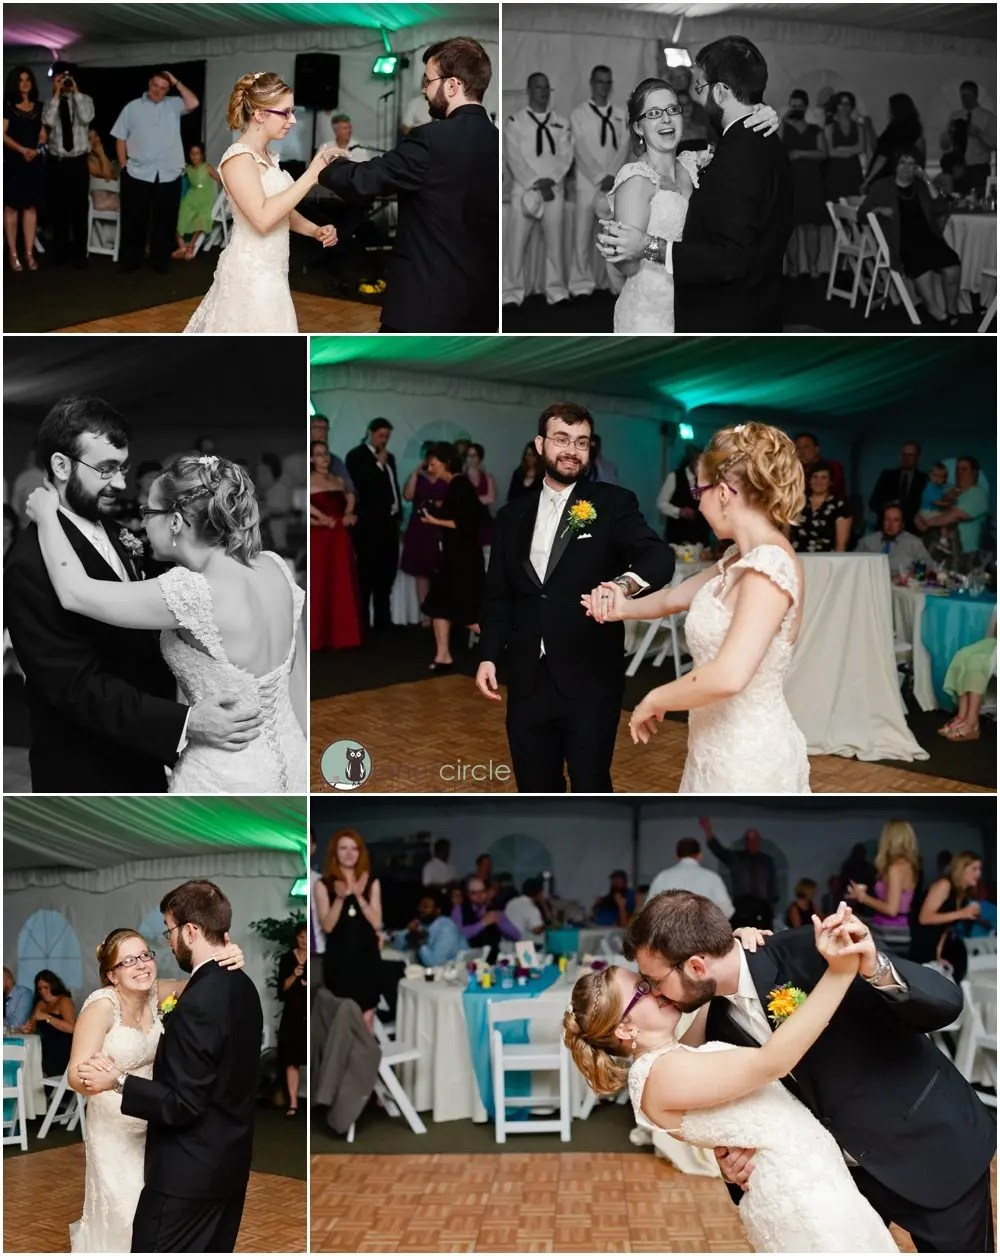 MIR_5688 Joe and Ashley MARRIED!